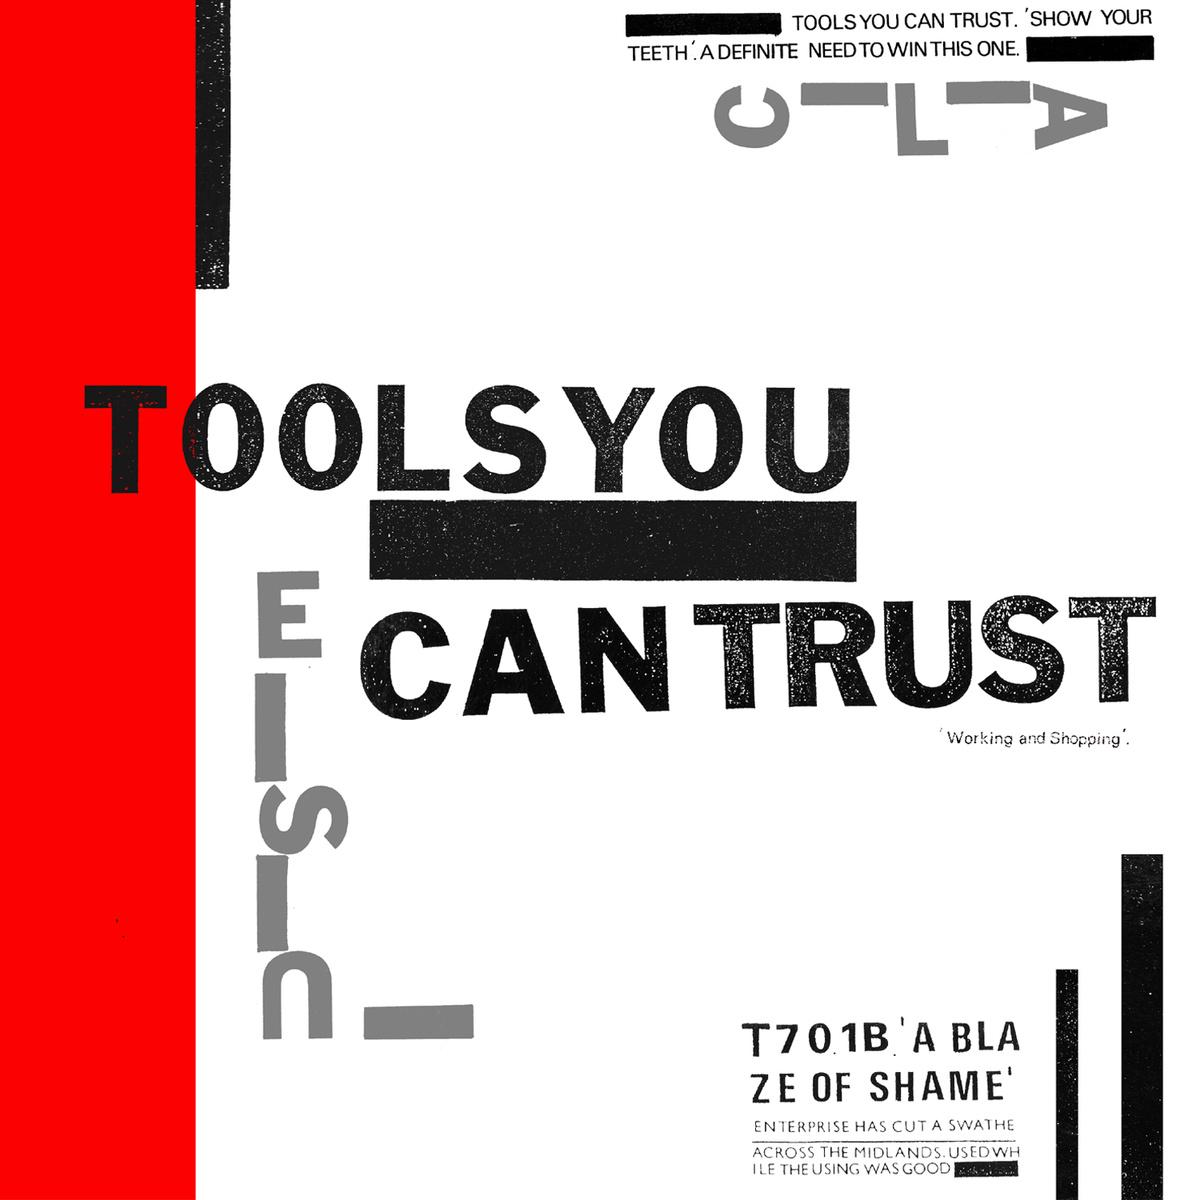 toolsyoucantrust